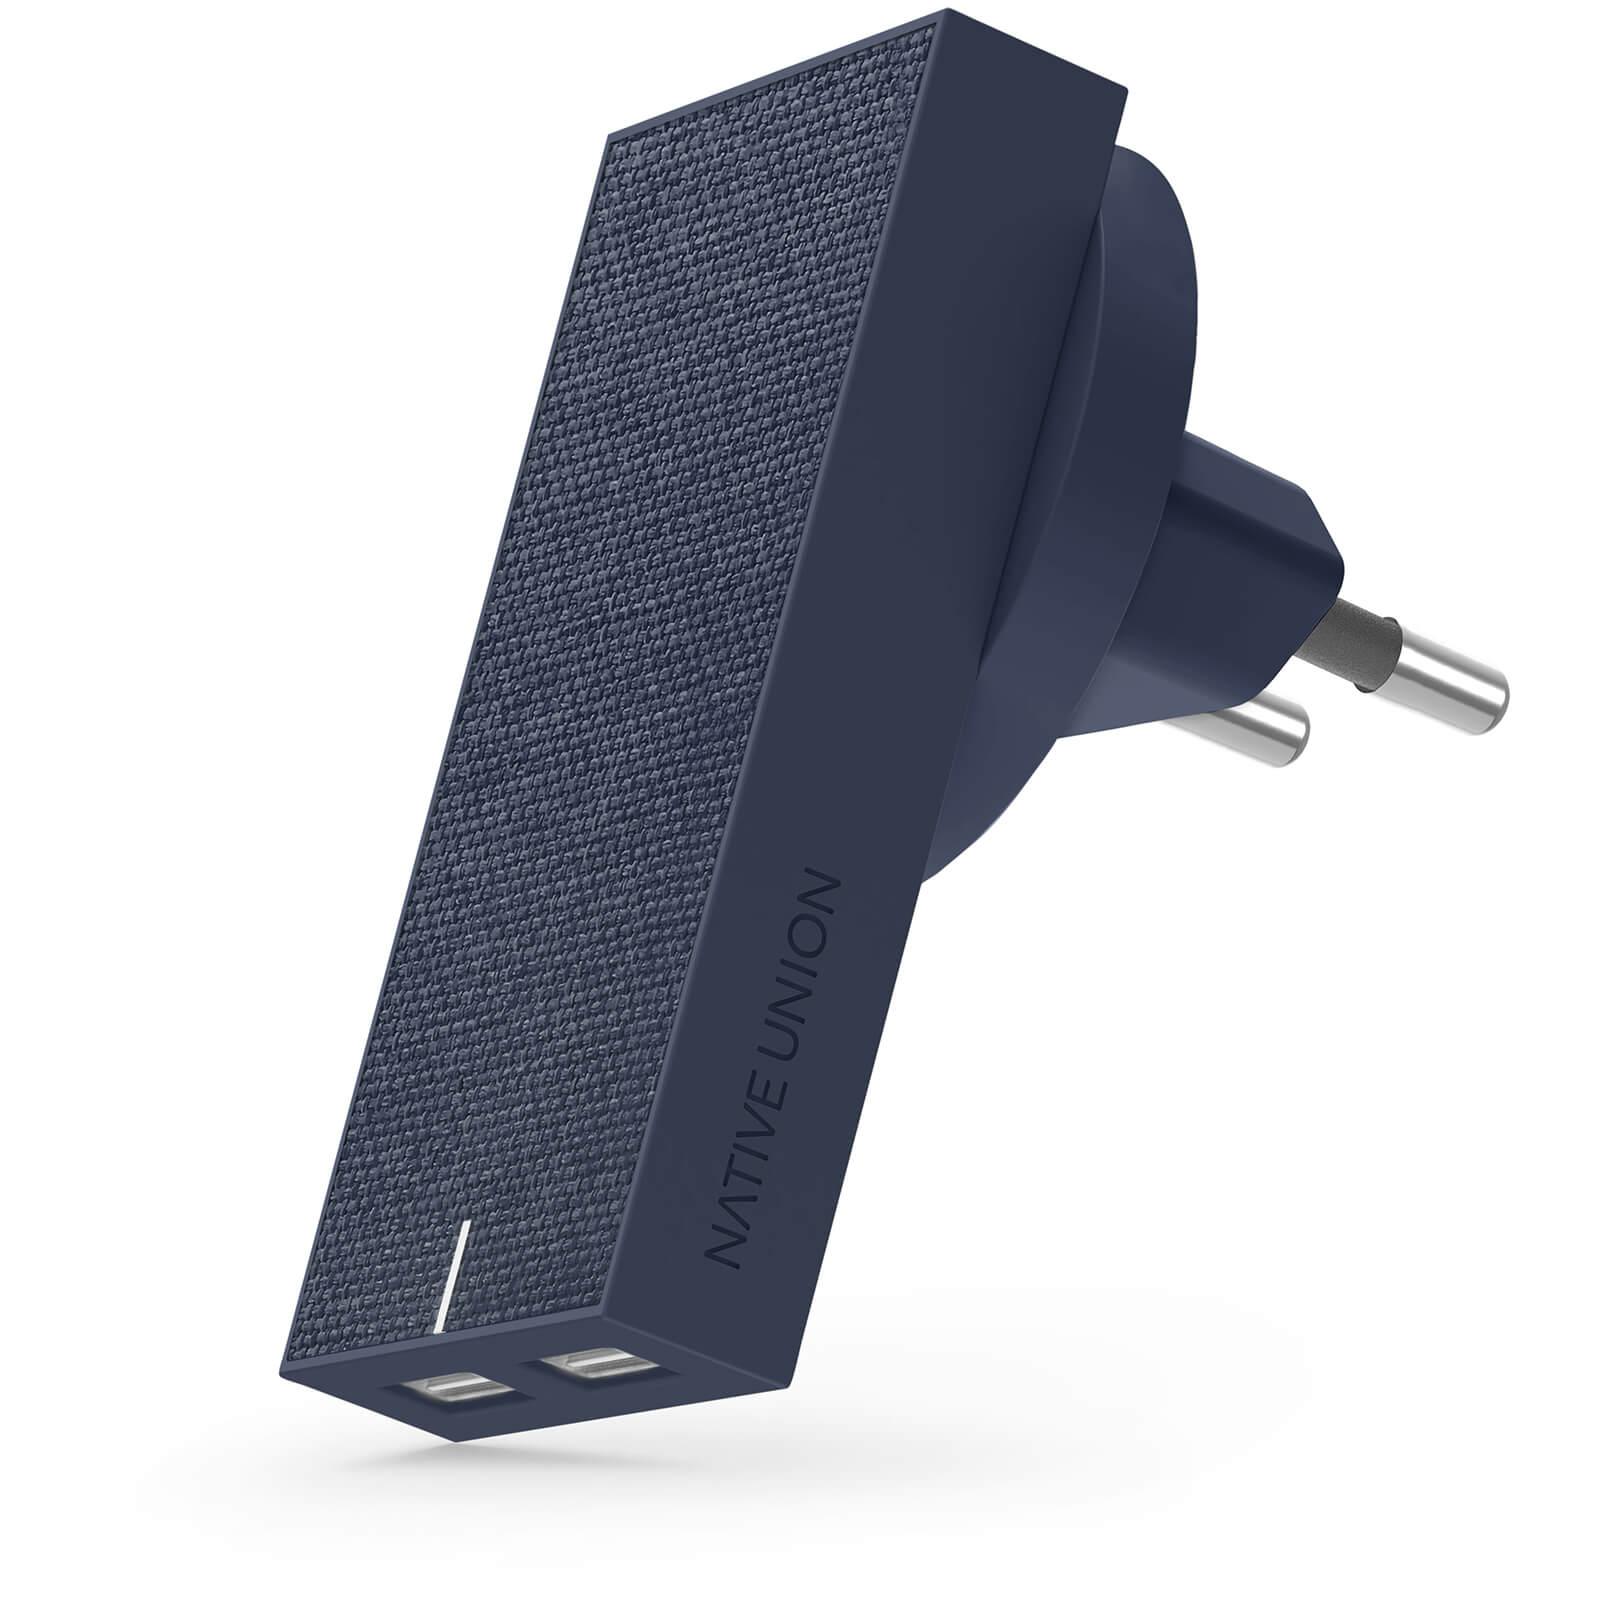 Native Union Smart Dual Port USB Fabric Charger - Marine